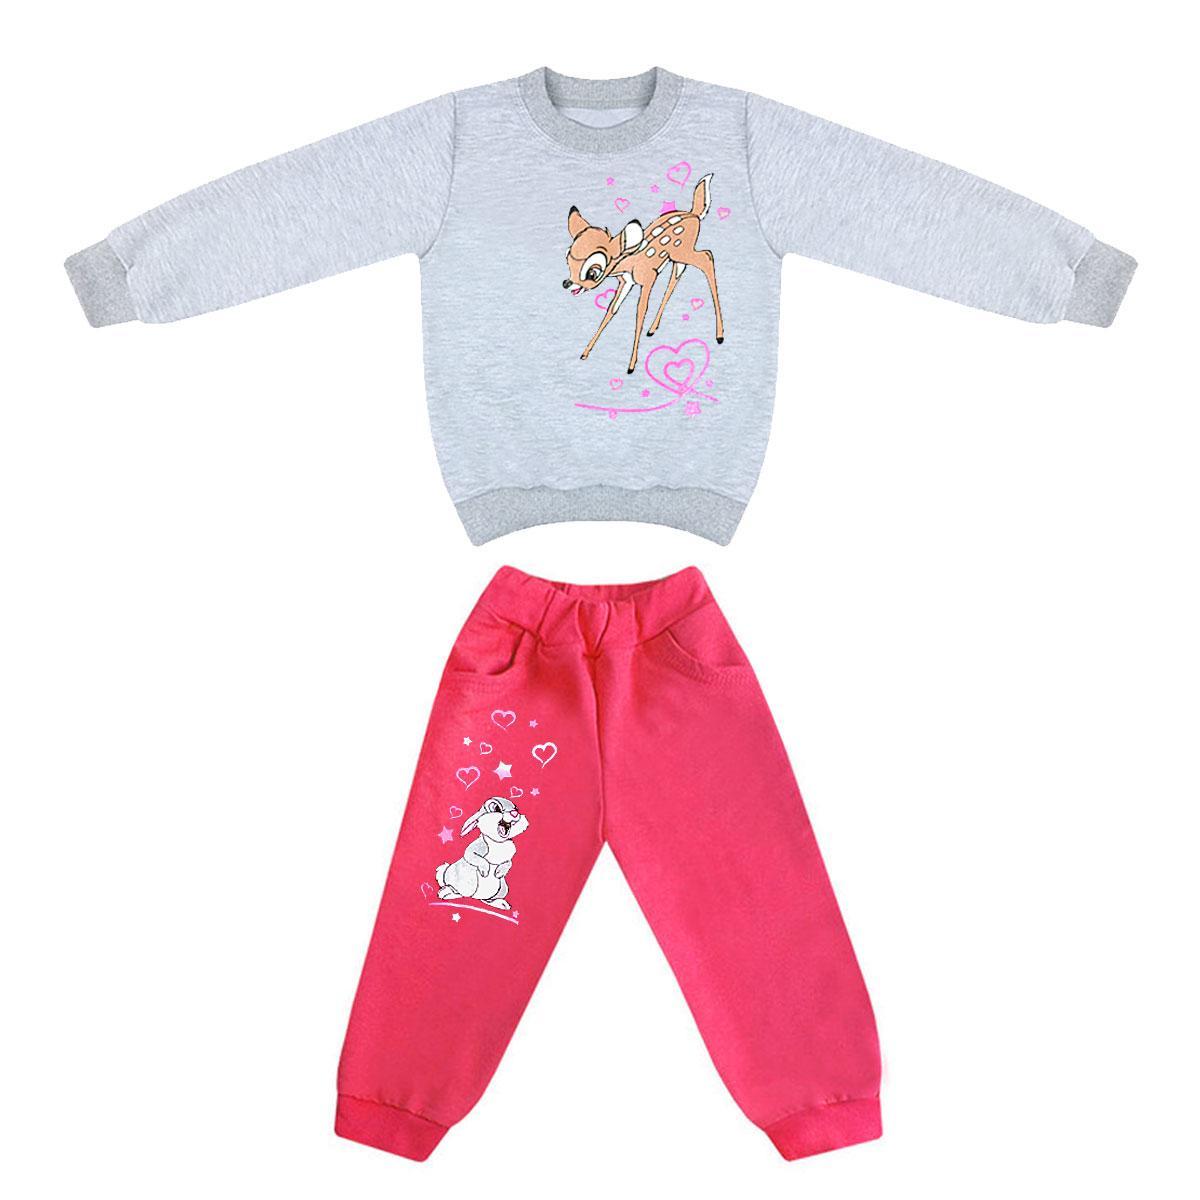 Костюм детский для девочки на 1-2 года Бэмби трехнитка-начес